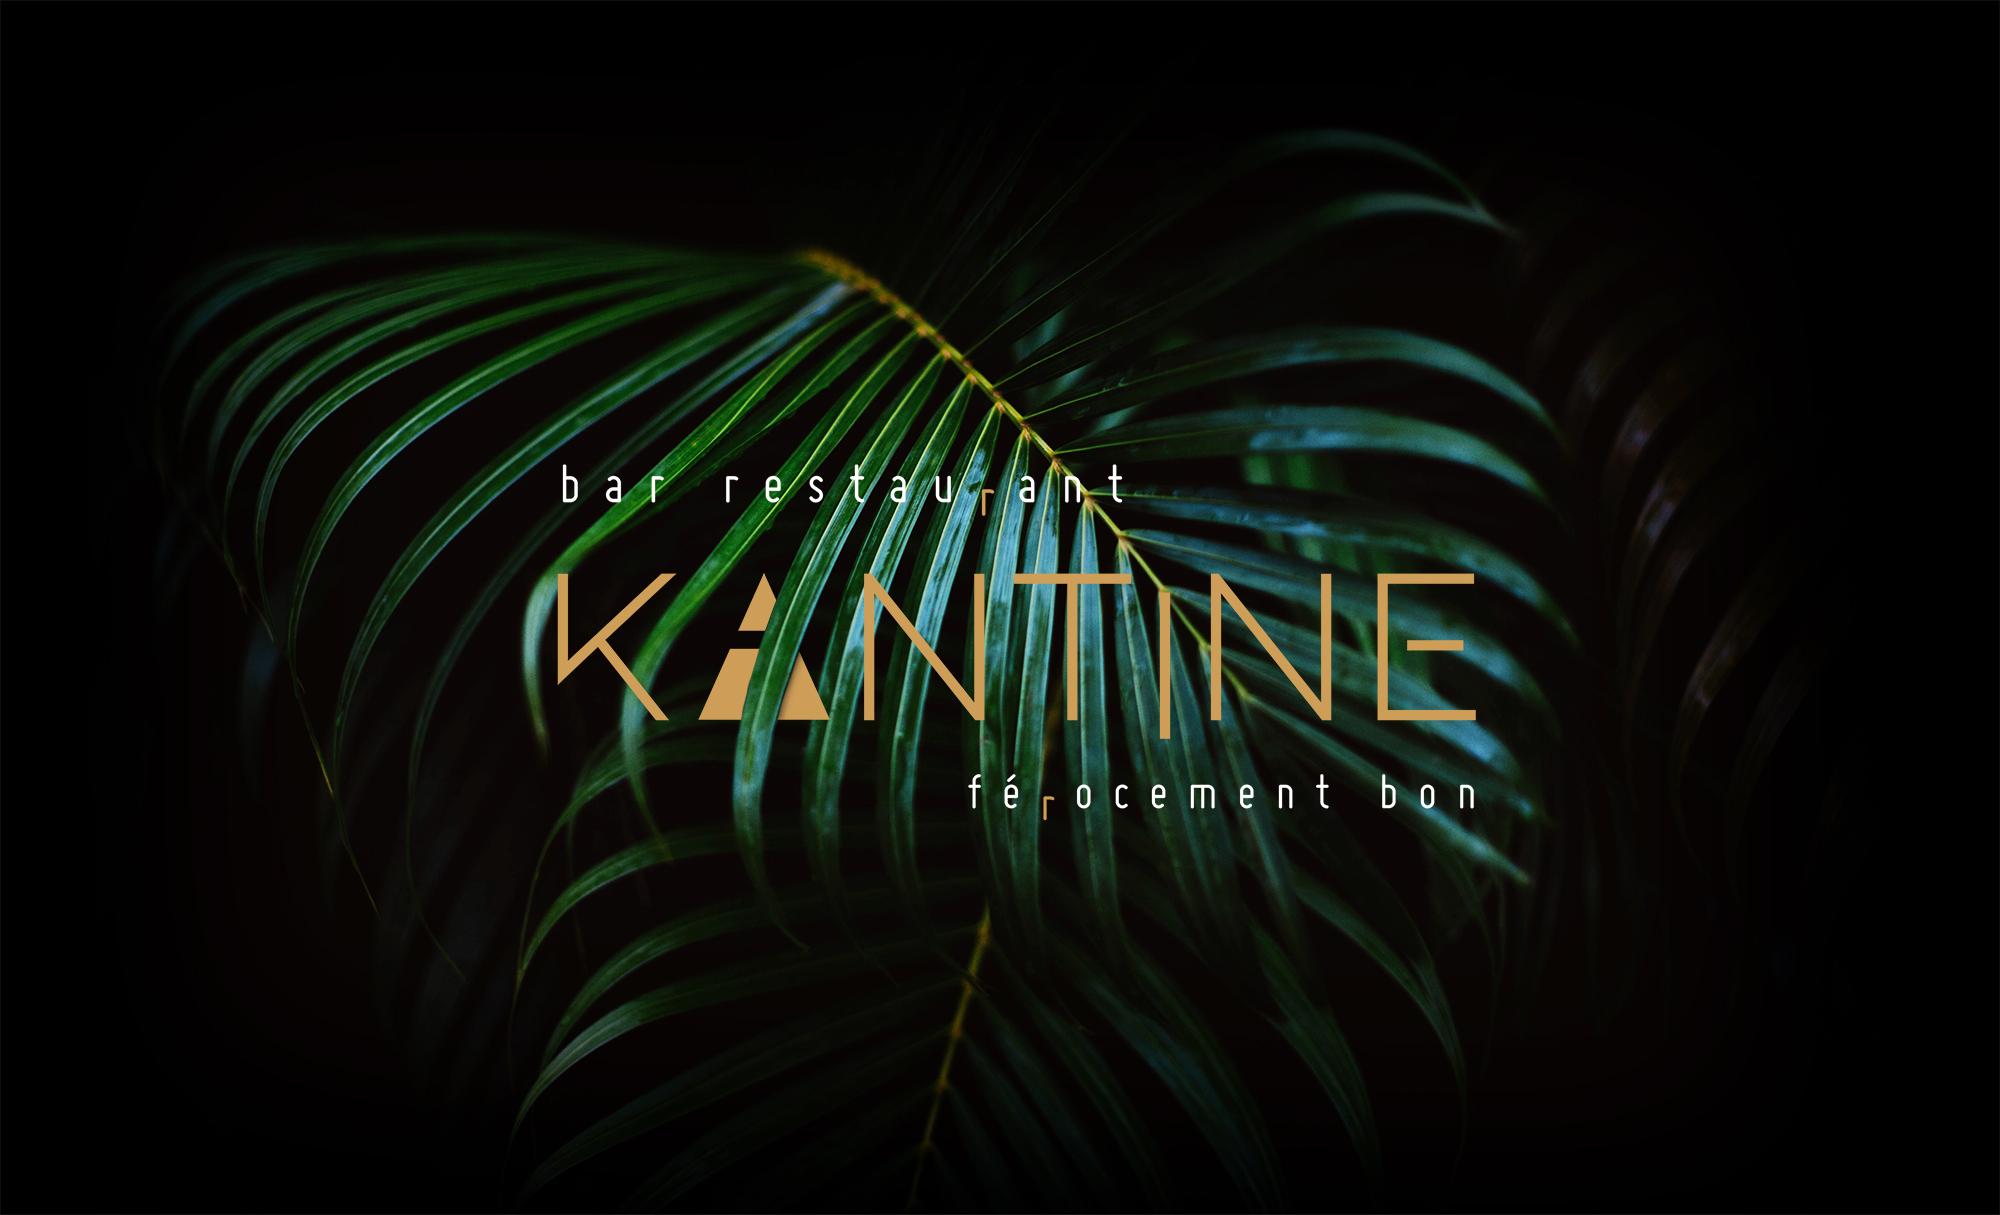 Palme Kantine Bar Restaurant Férocement Bon